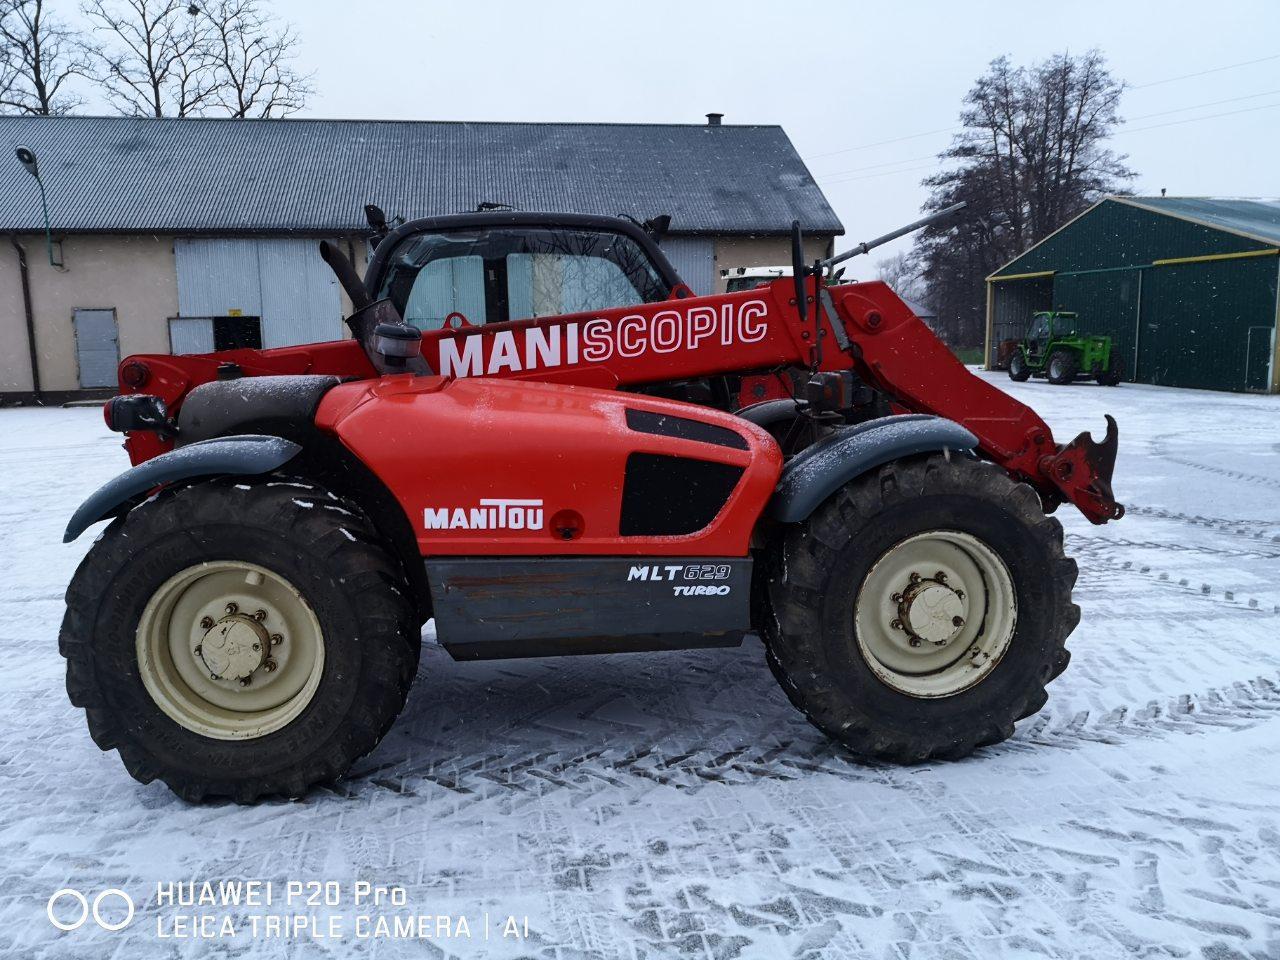 MANITOU MLT 629